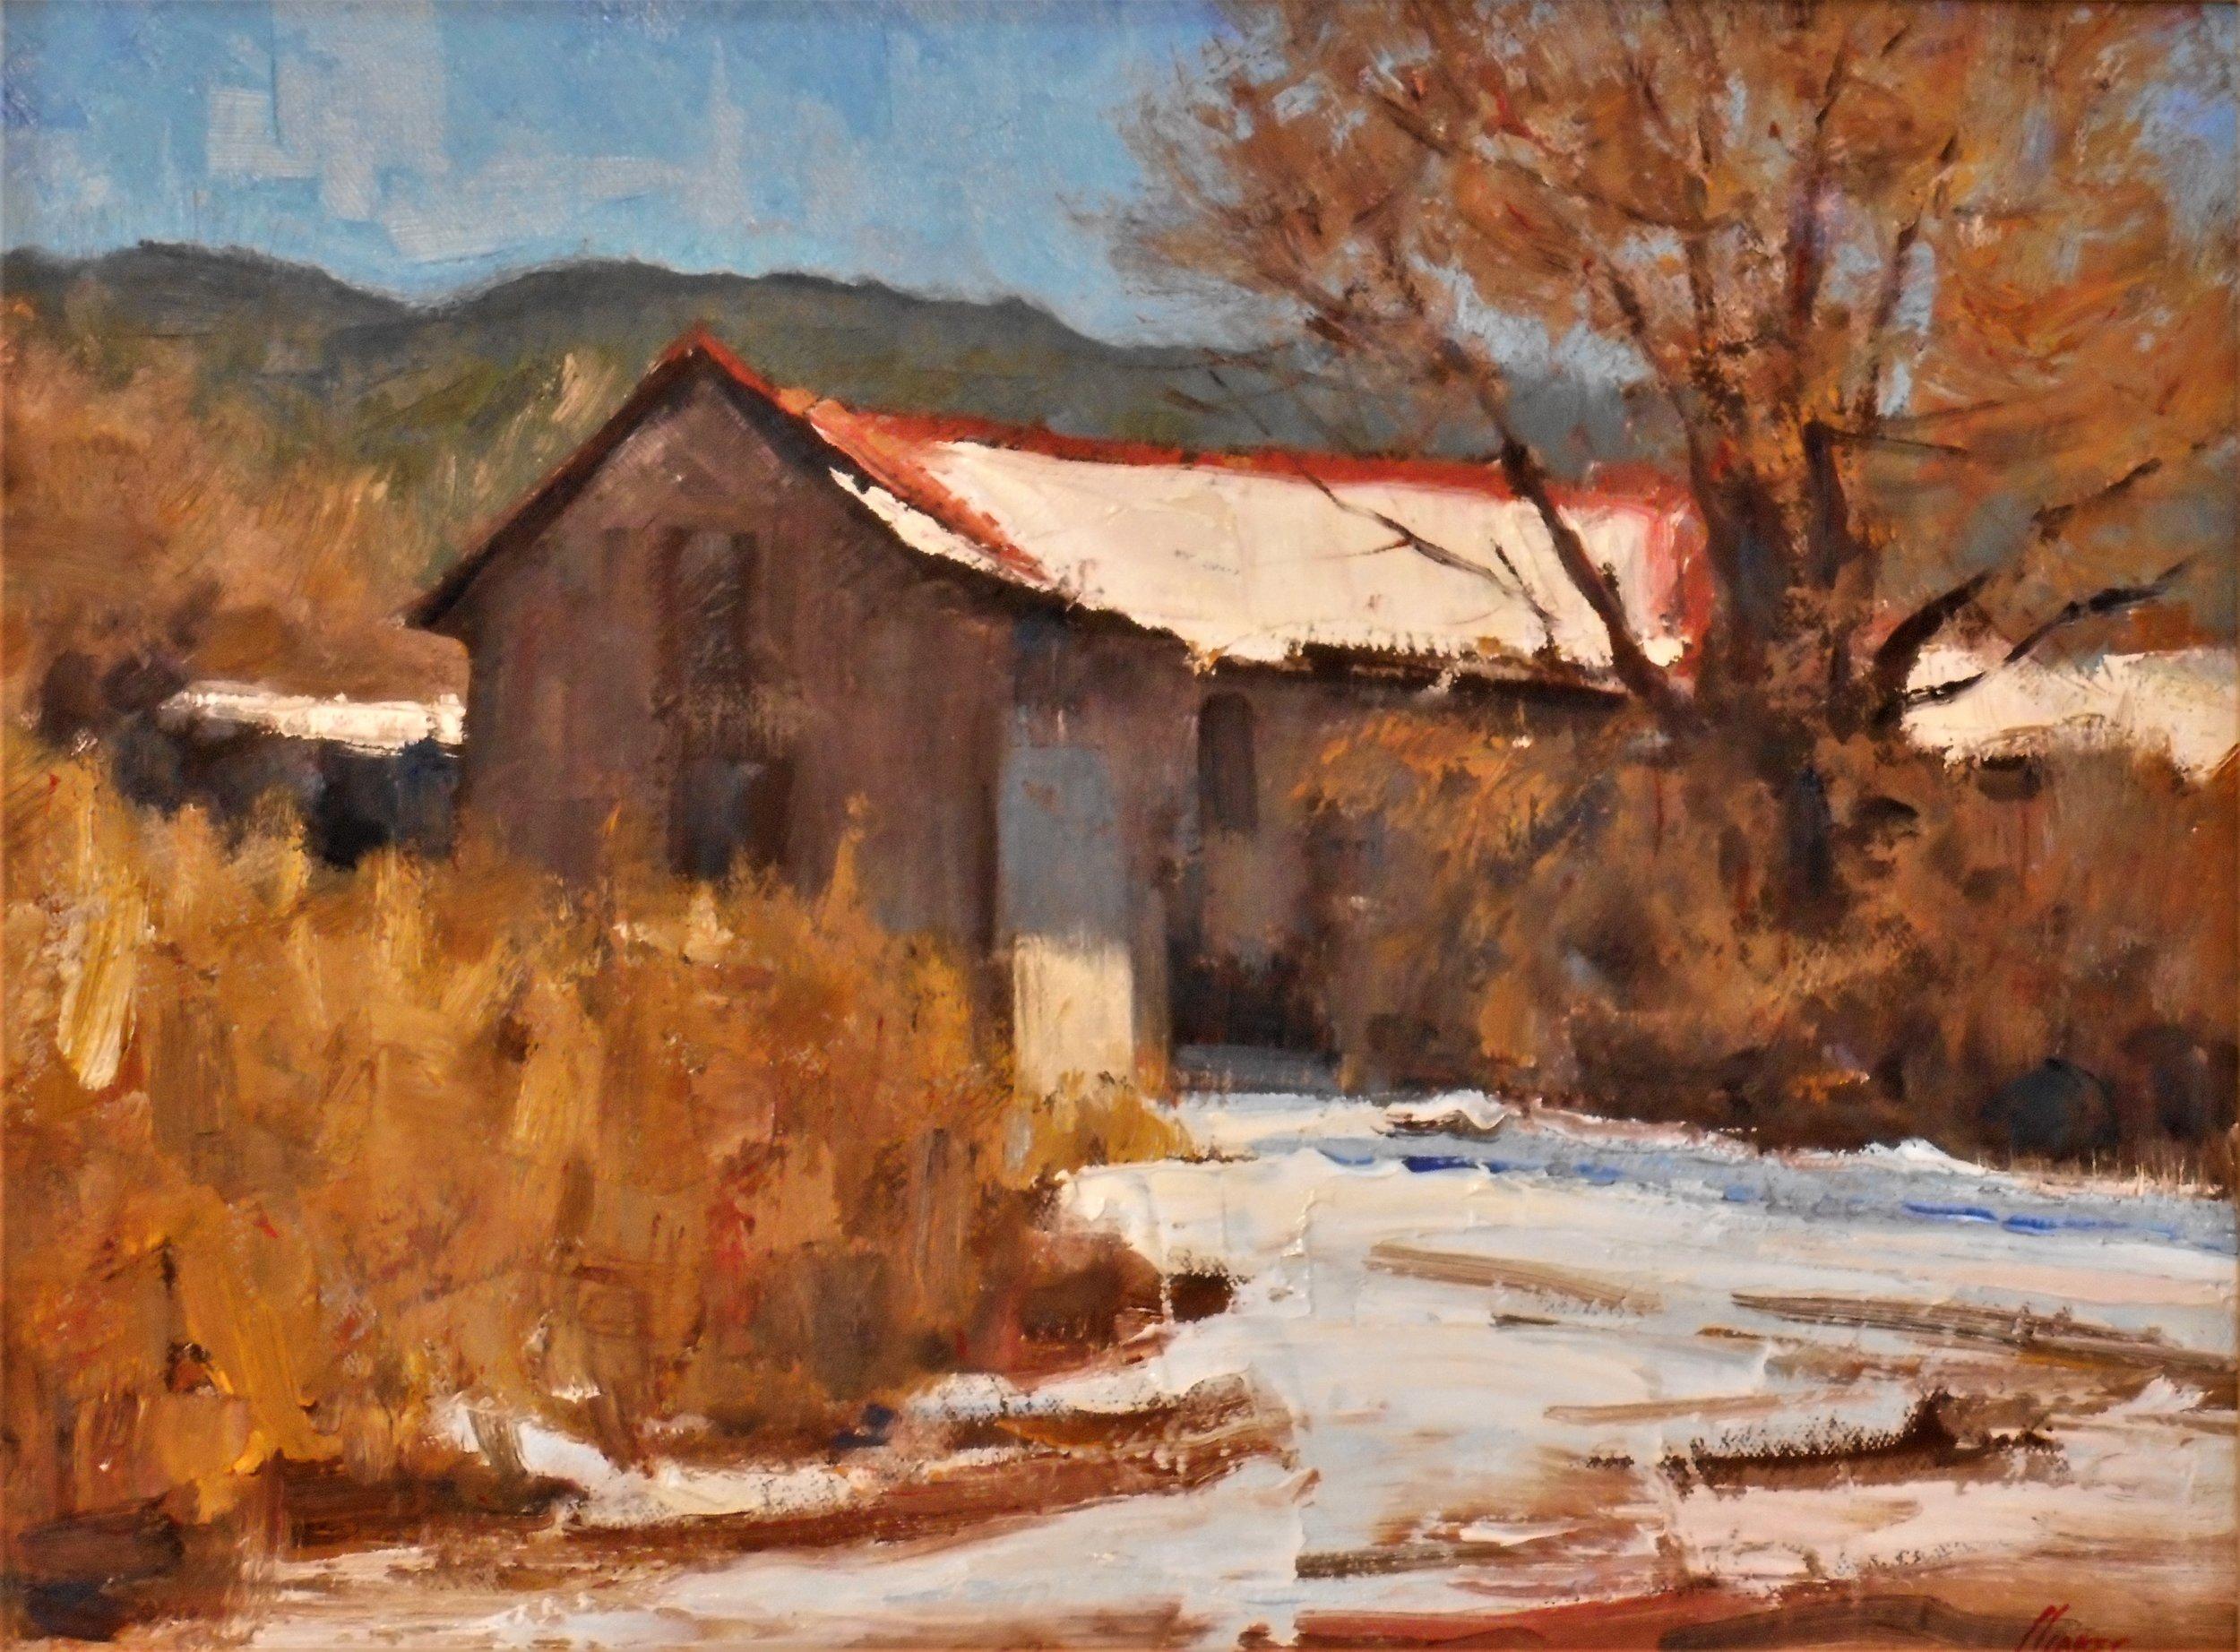 Winter New Mexico Oil 12 x 16 $3200.JPG